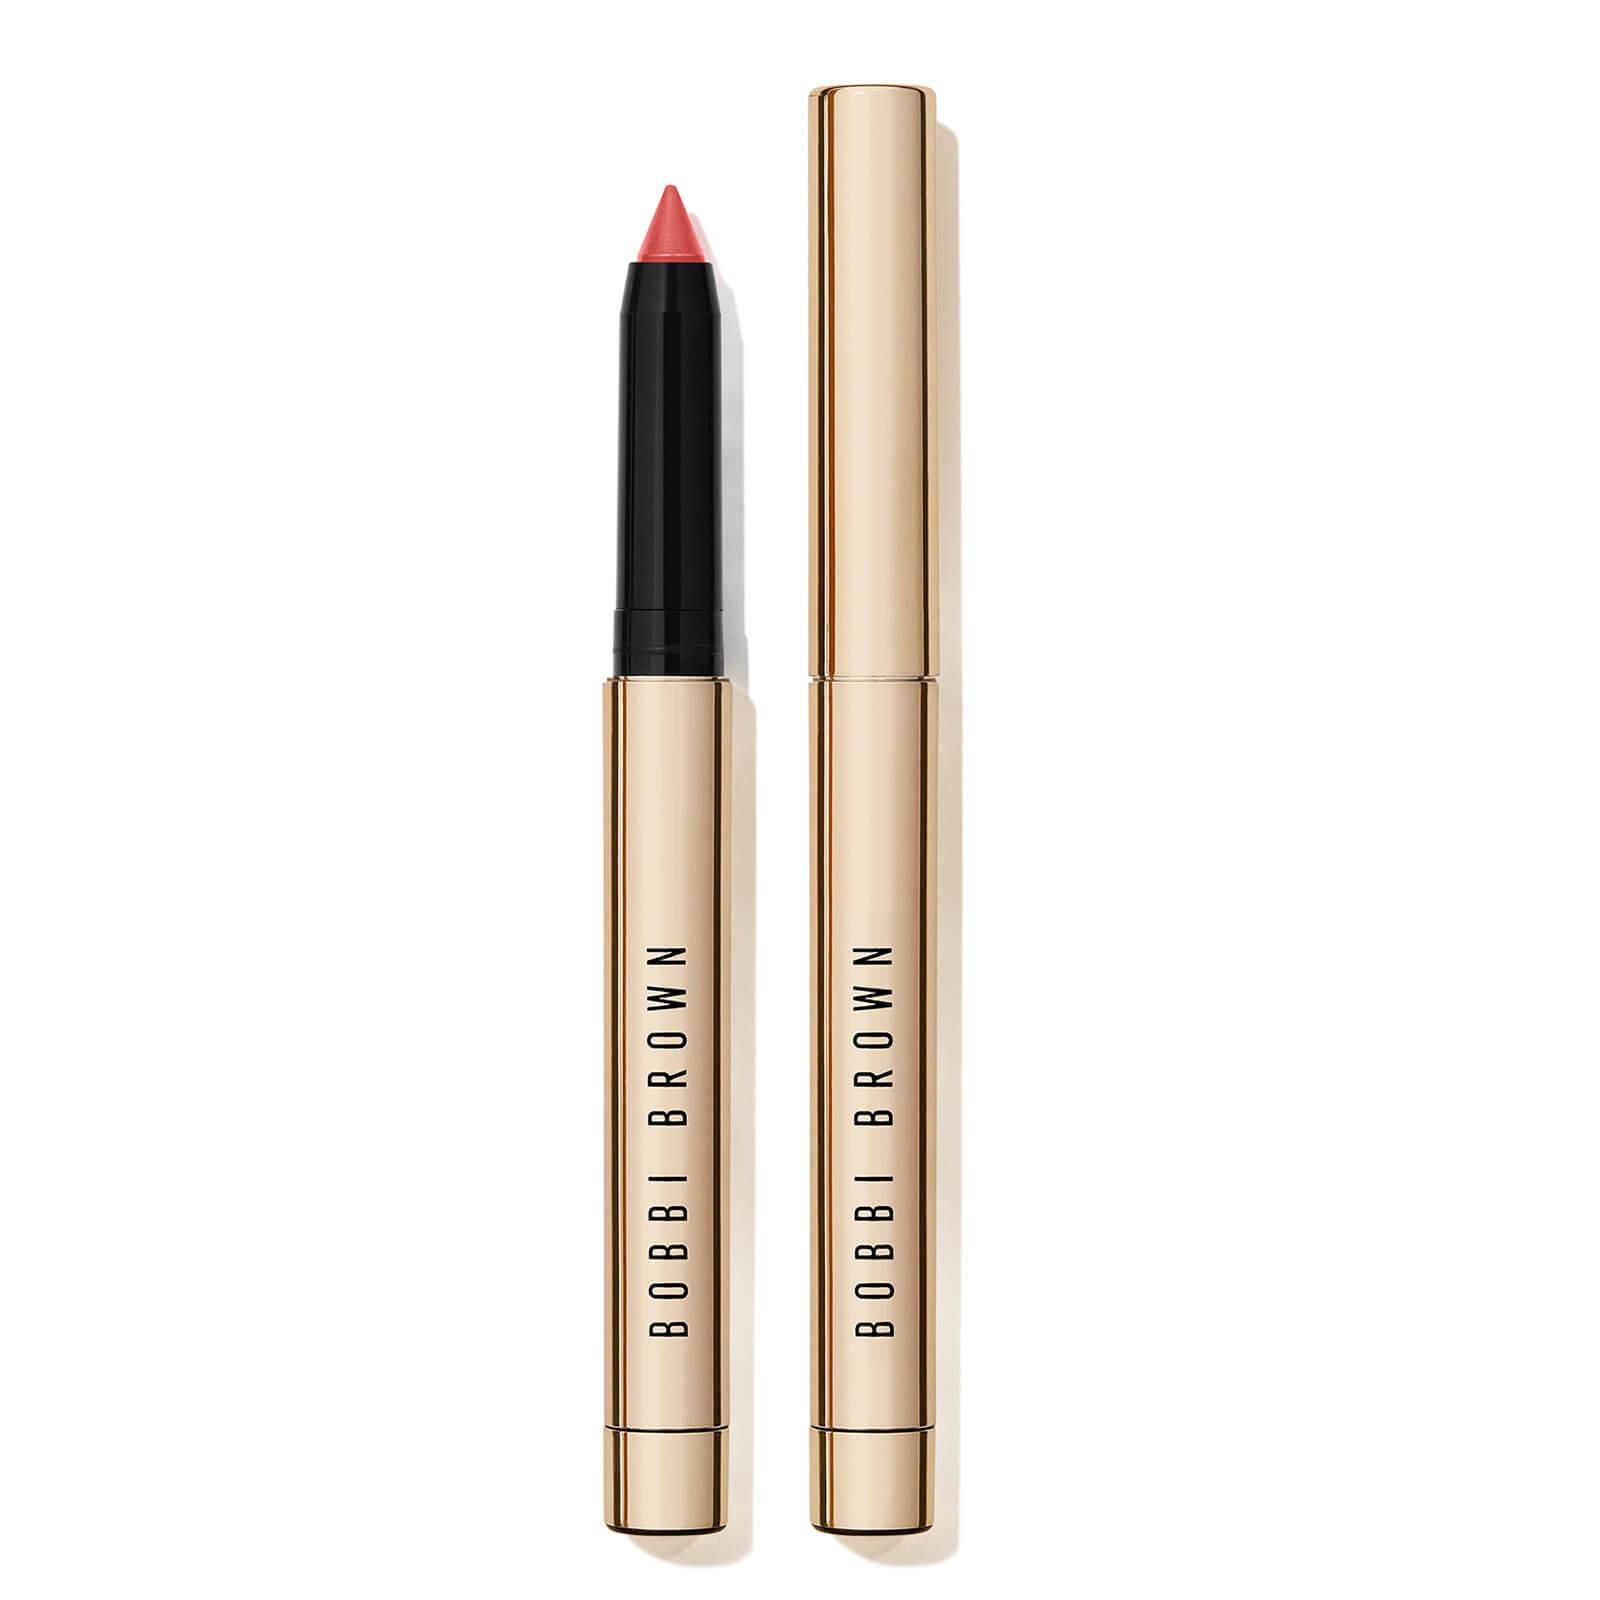 Bobbi Brown Luxe Defining Lipstick 6g - Various Shades - Waterlily